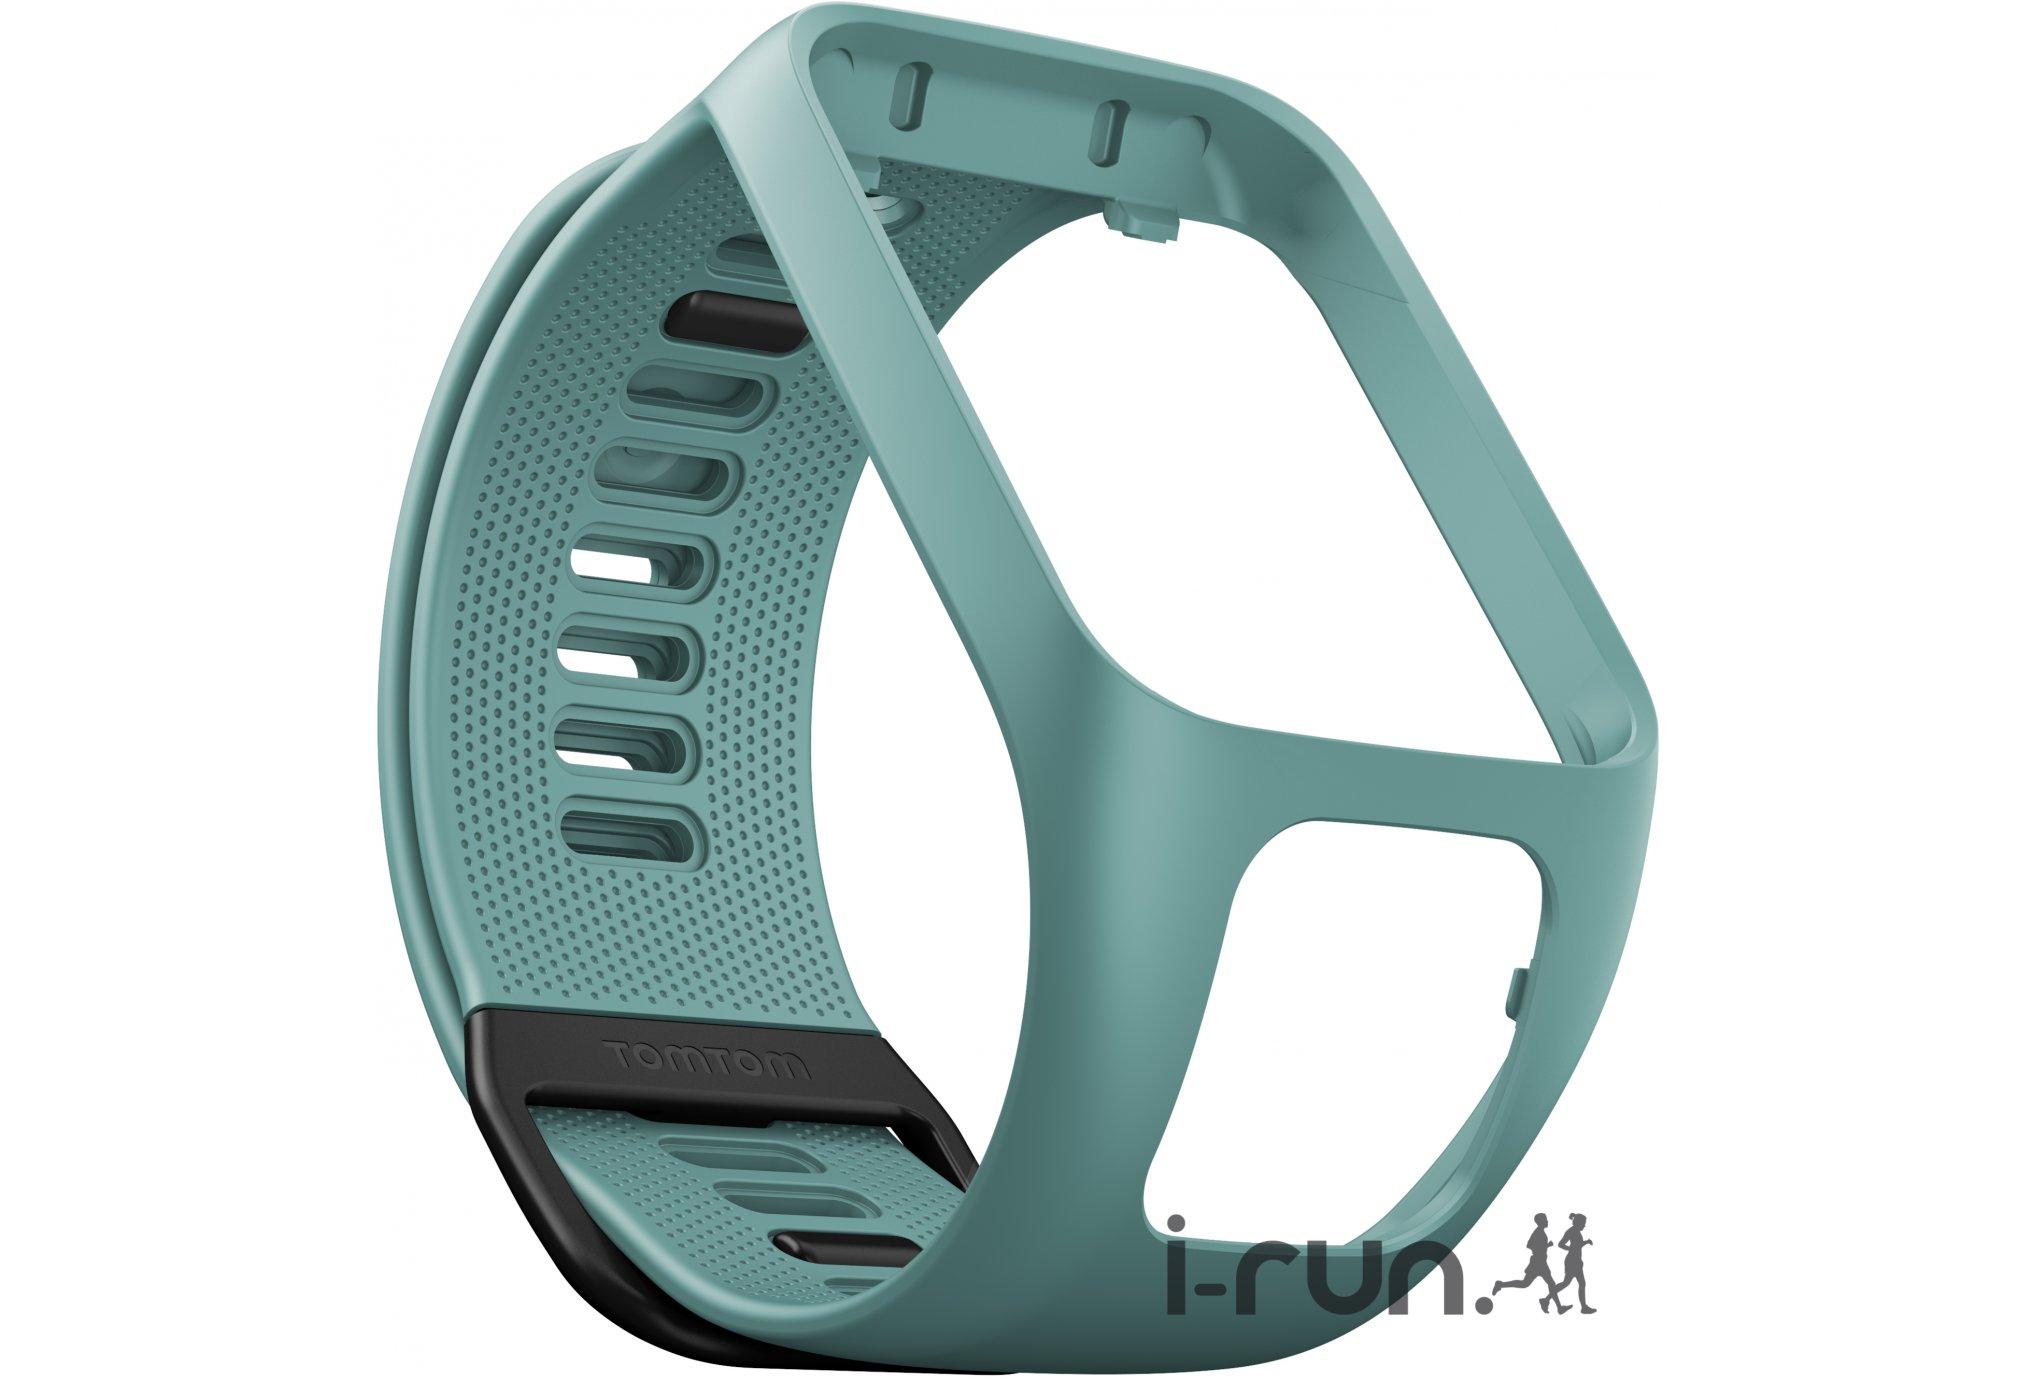 Tomtom Bracelet de montre runner et spark - large accessoires montres/ bracelets